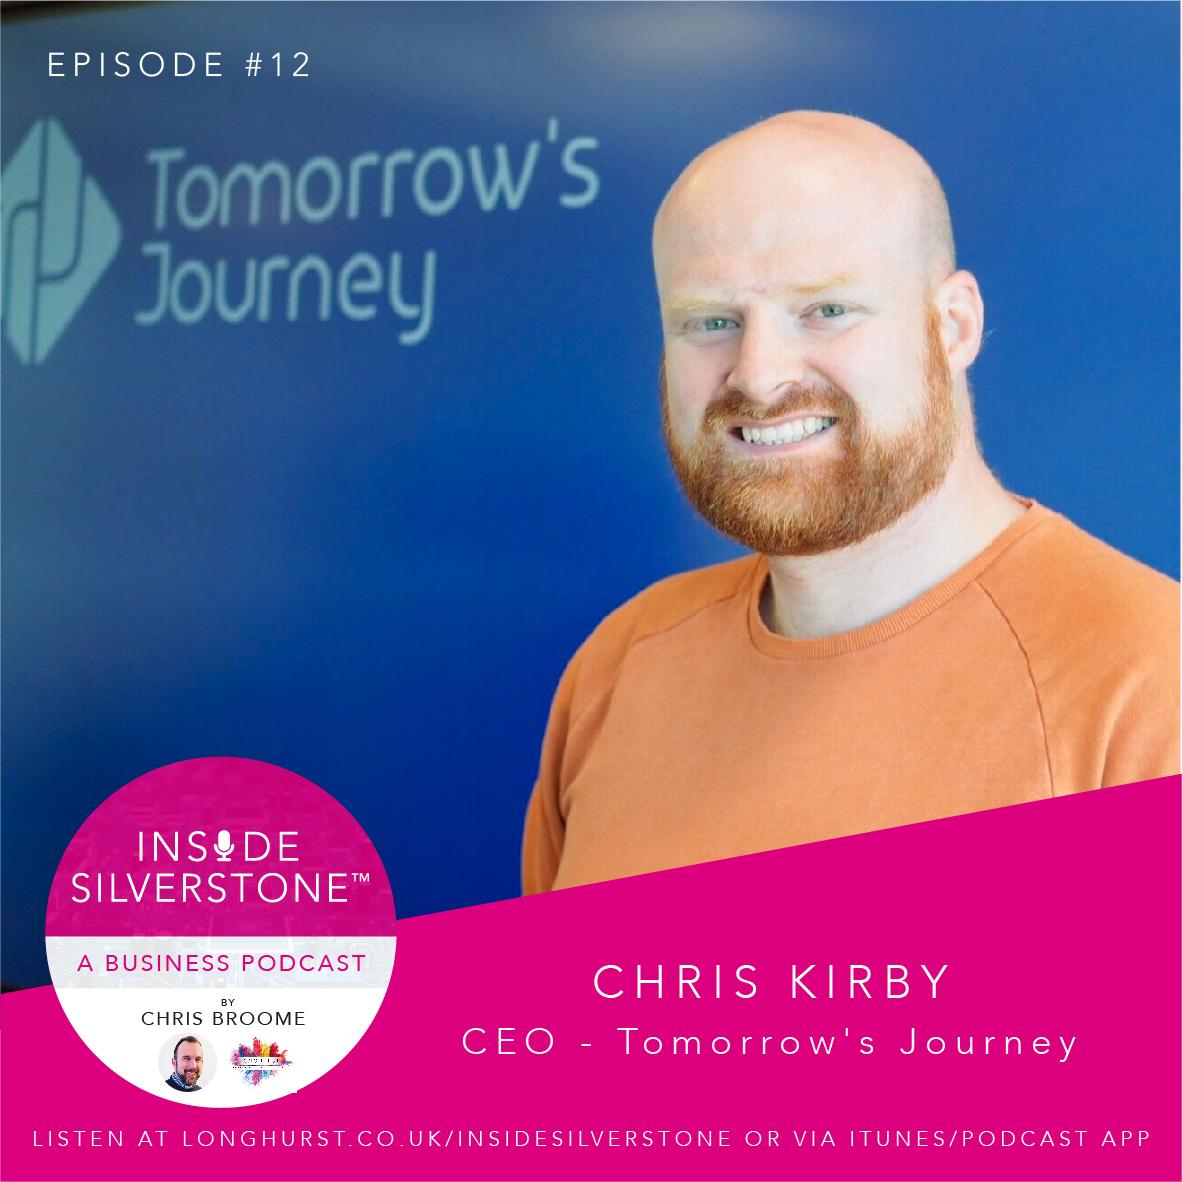 Chris Kirby, CEO of Tomorrow's Journey